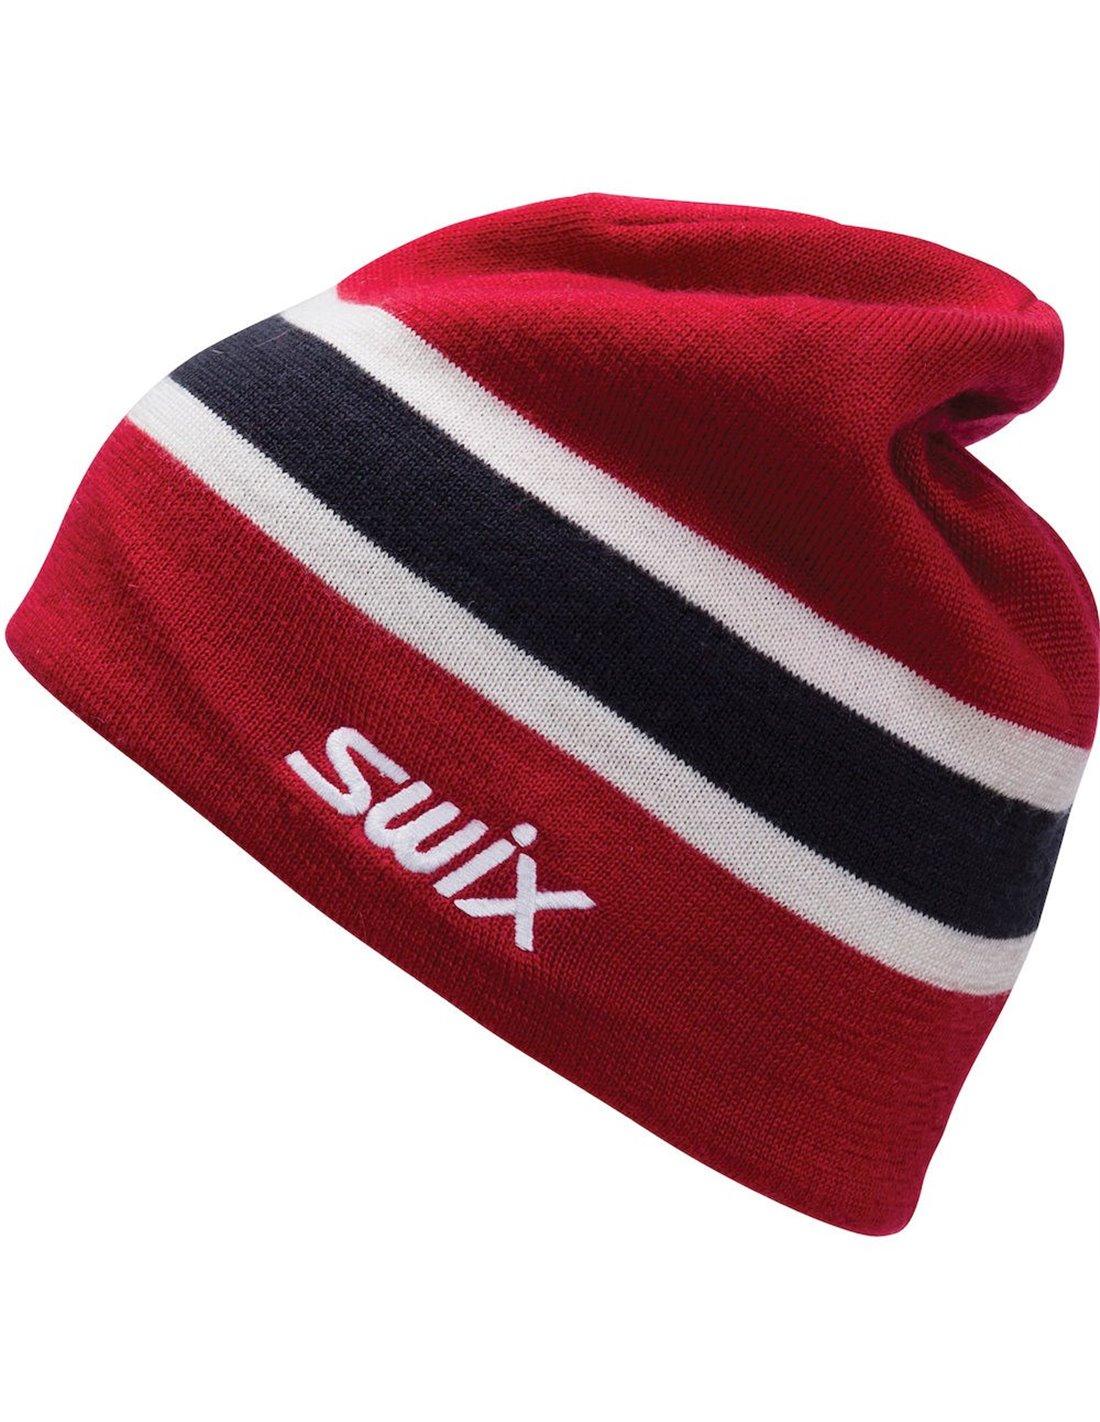 Swix Norway Beanie